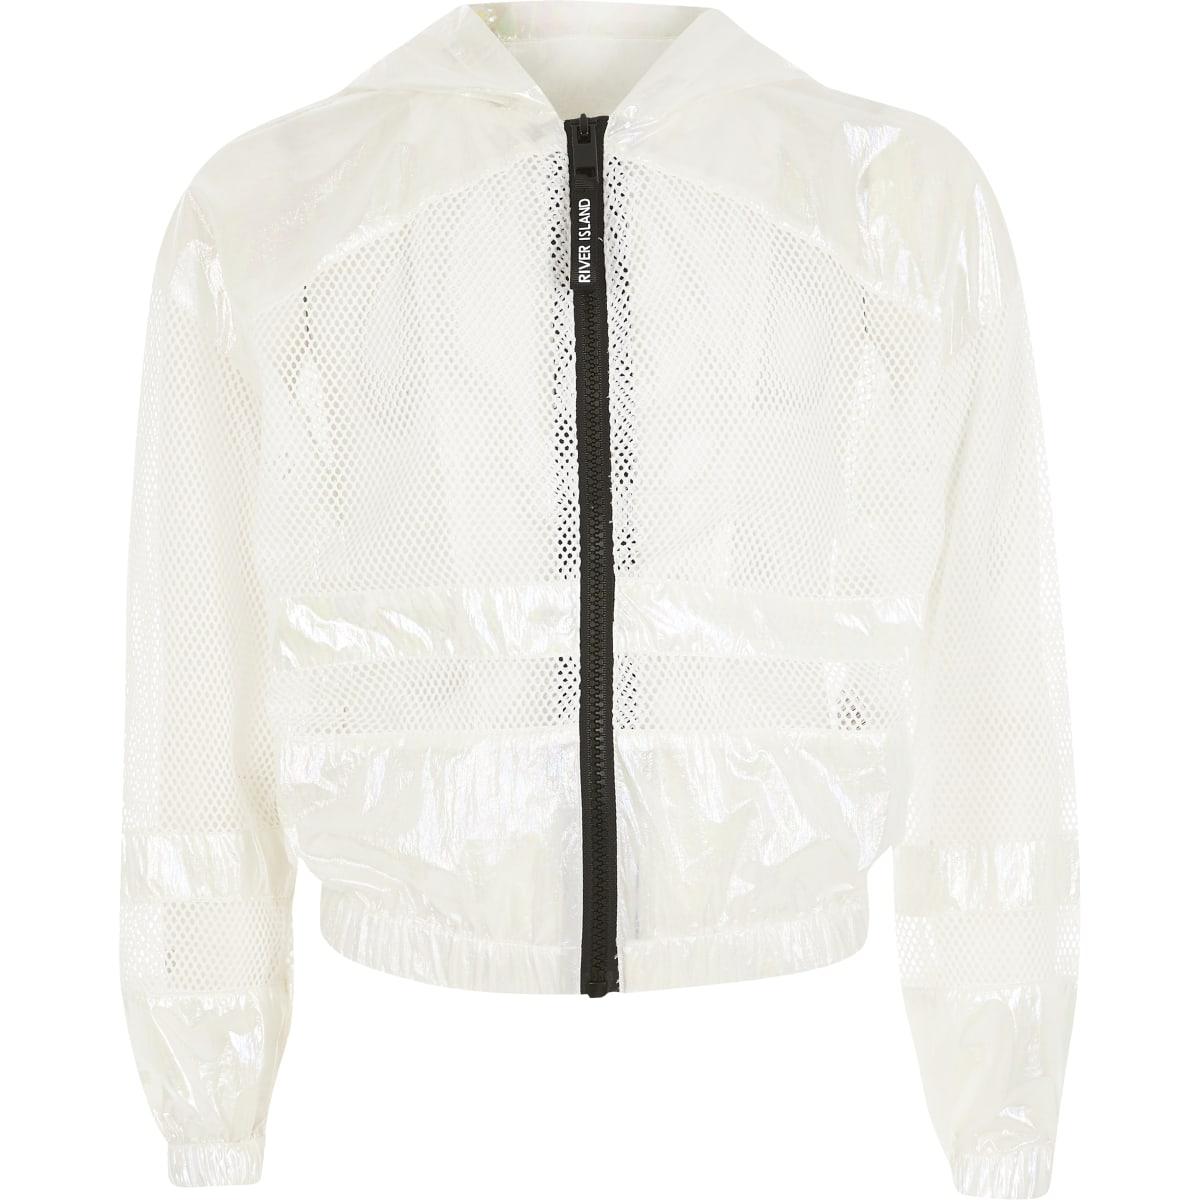 Girls RI Active white mesh jacket